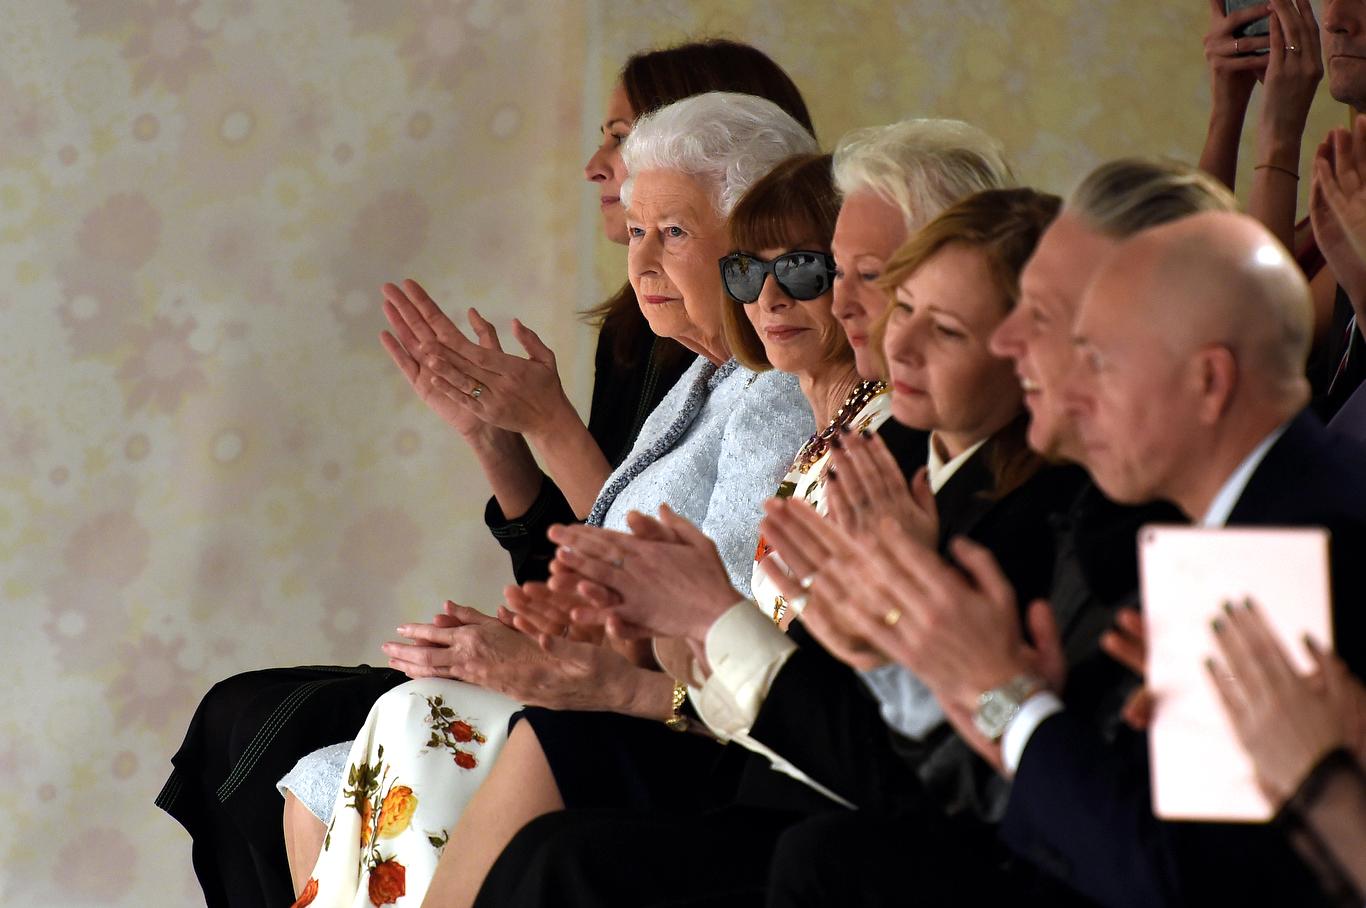 Queen Elizabeth sitting front row between Caroline Rush and Anna Wintour